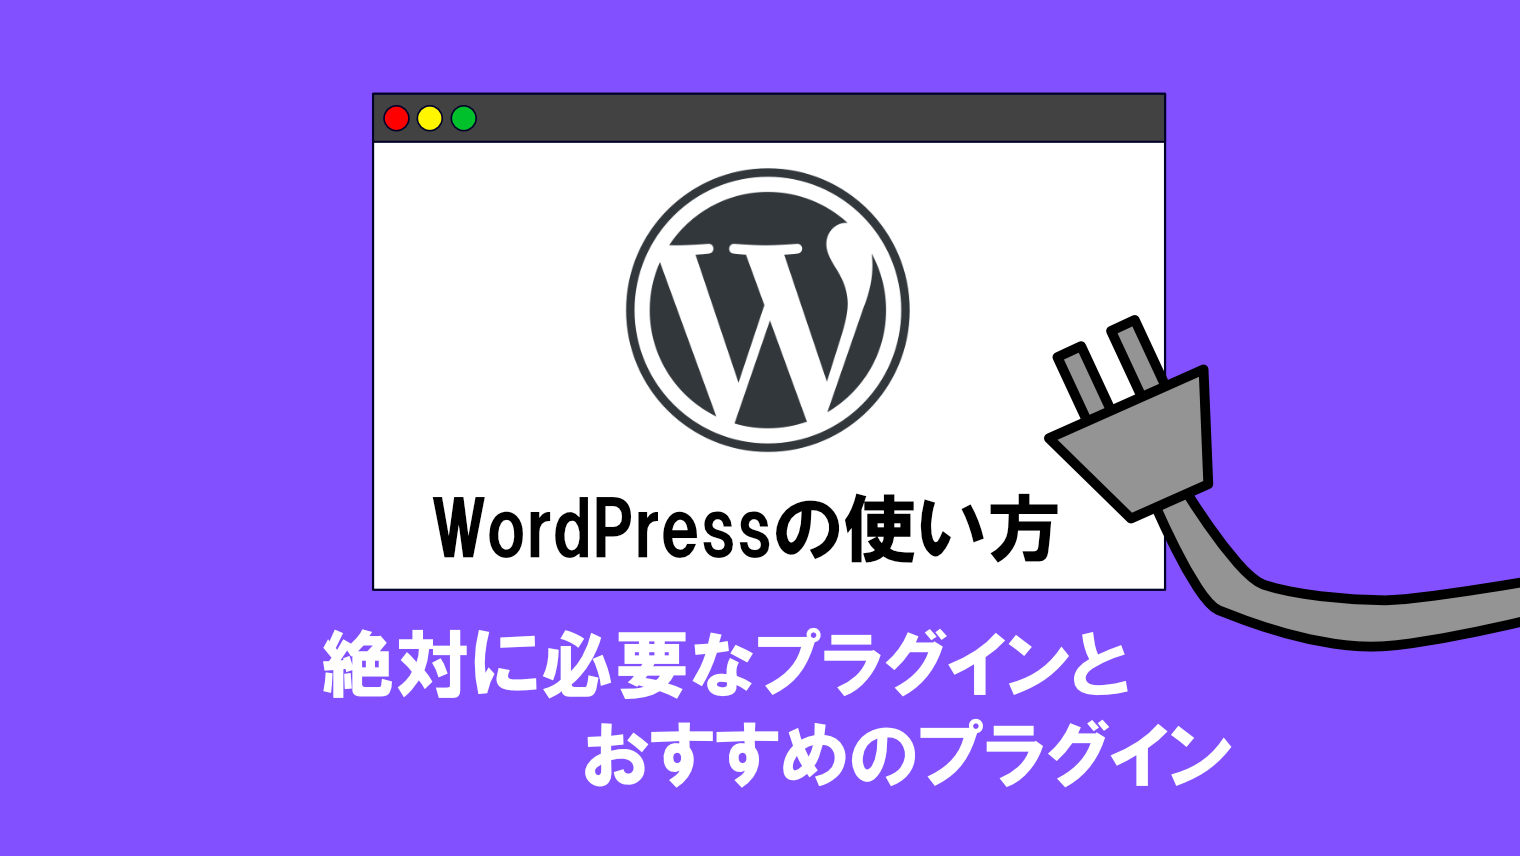 【WordPress】絶対に必要なプラグイン4選&おすすめプラグイン4選